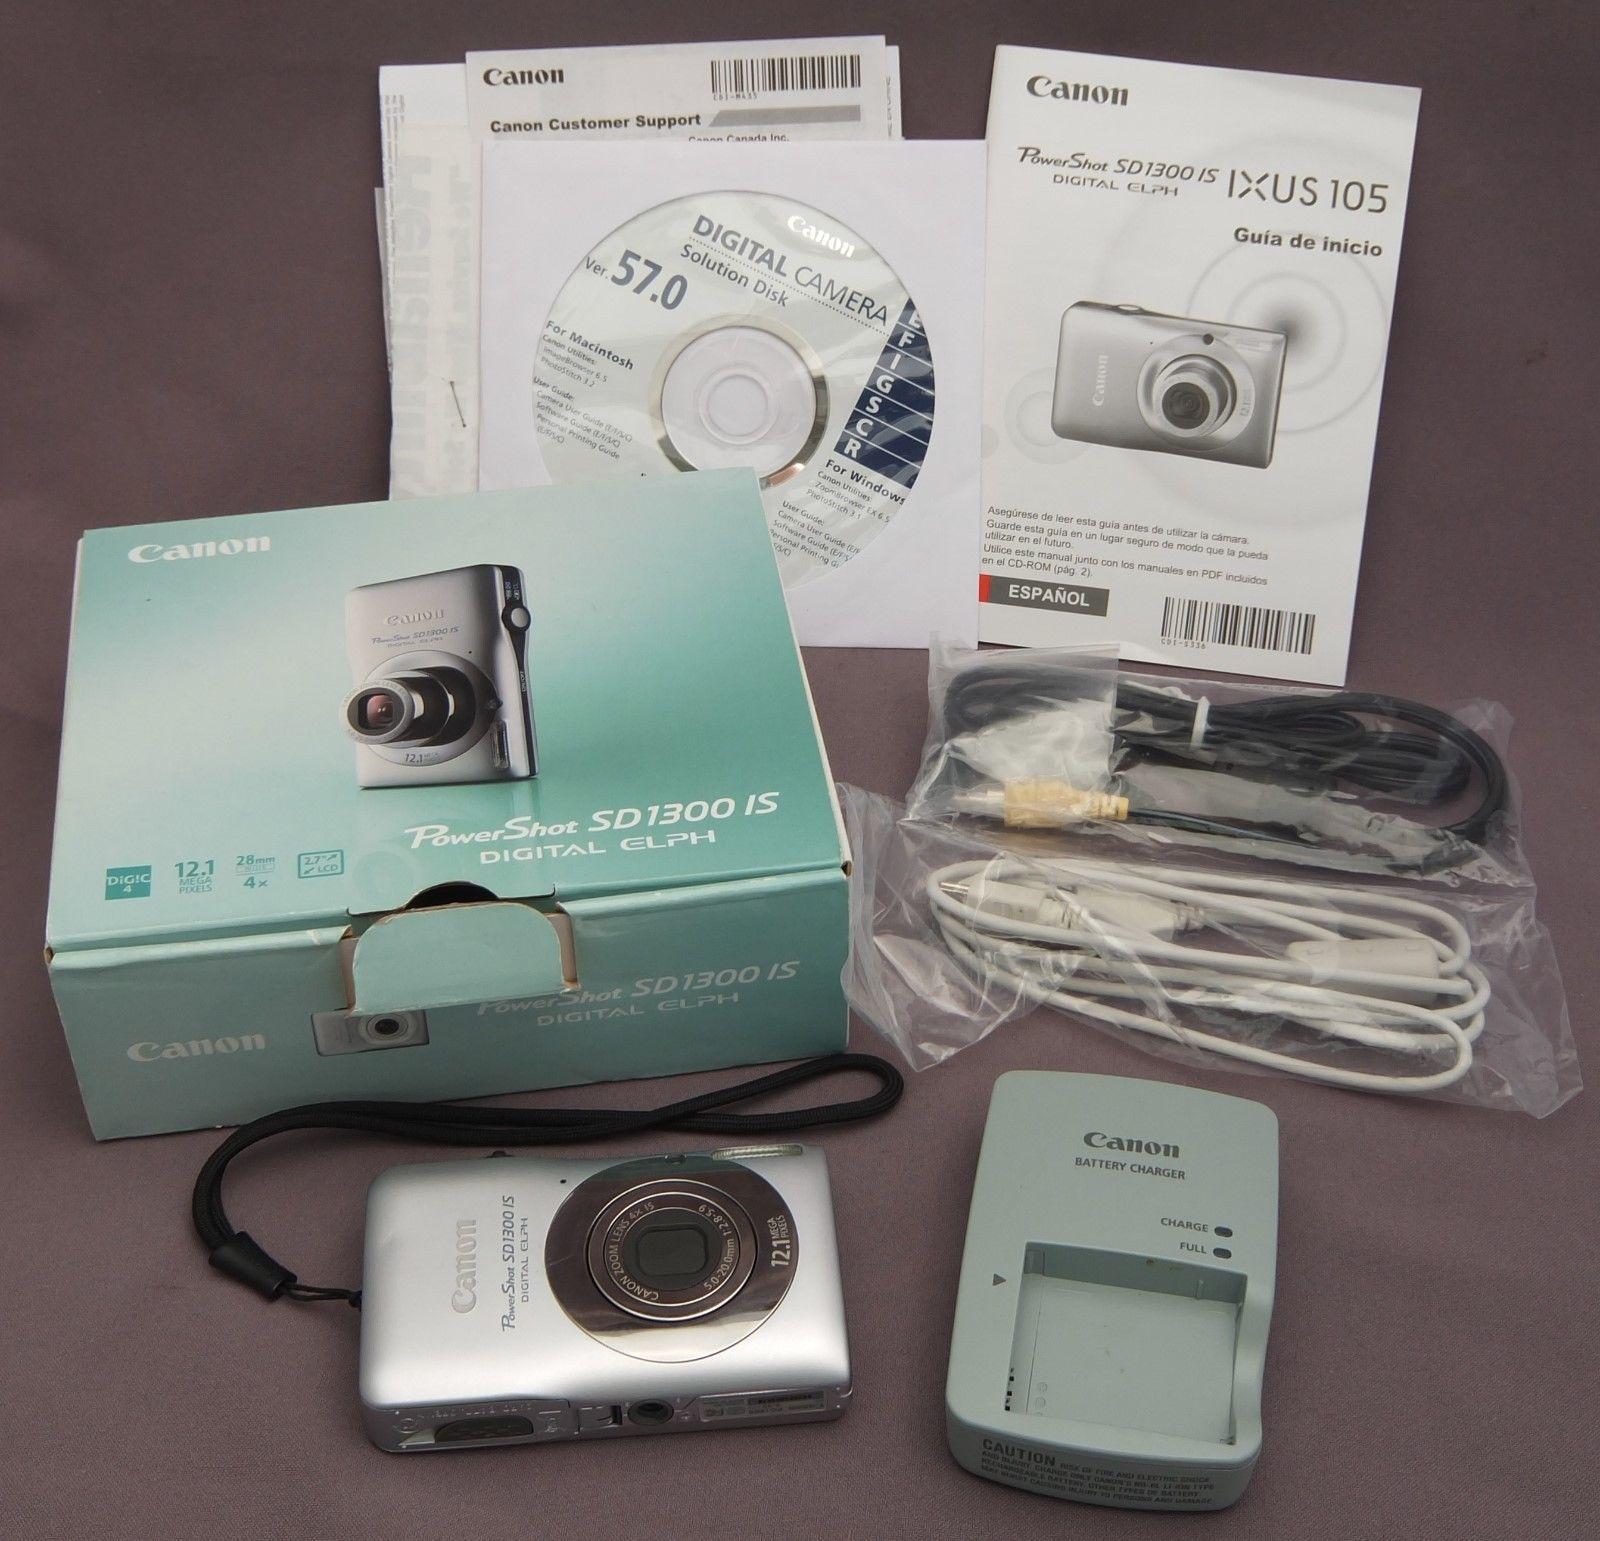 Canon Powershot Digital Elph Sd1300 Is 12 1 Mp Digital Camera Silver In Box Digital Camera Canon Digital Camera Powershot